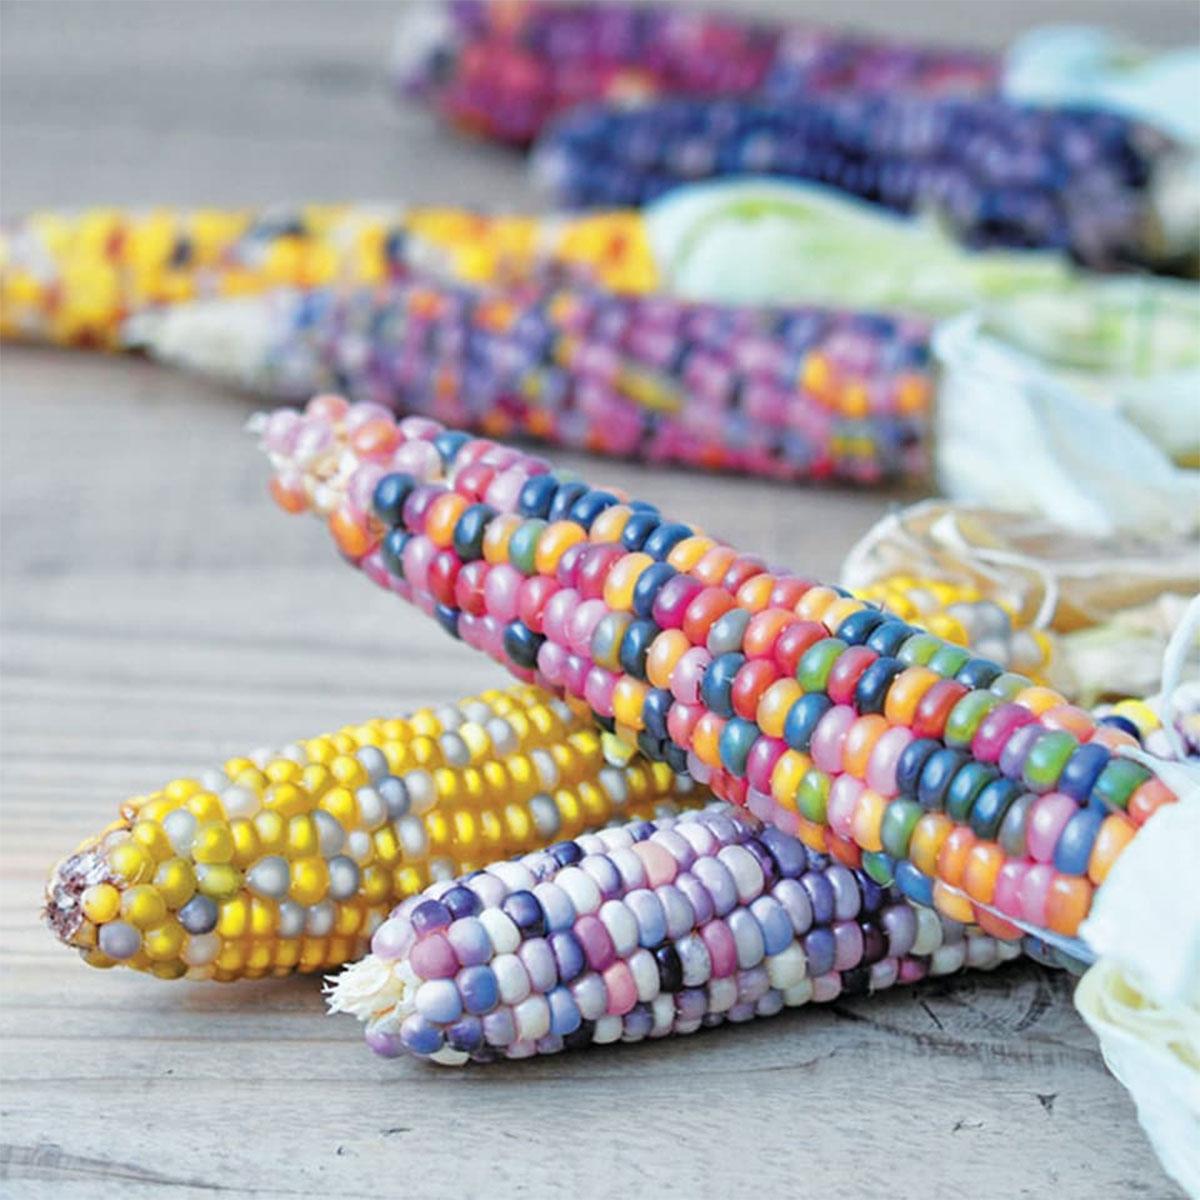 Regenbogen-Maiskolben Aufzuchtset